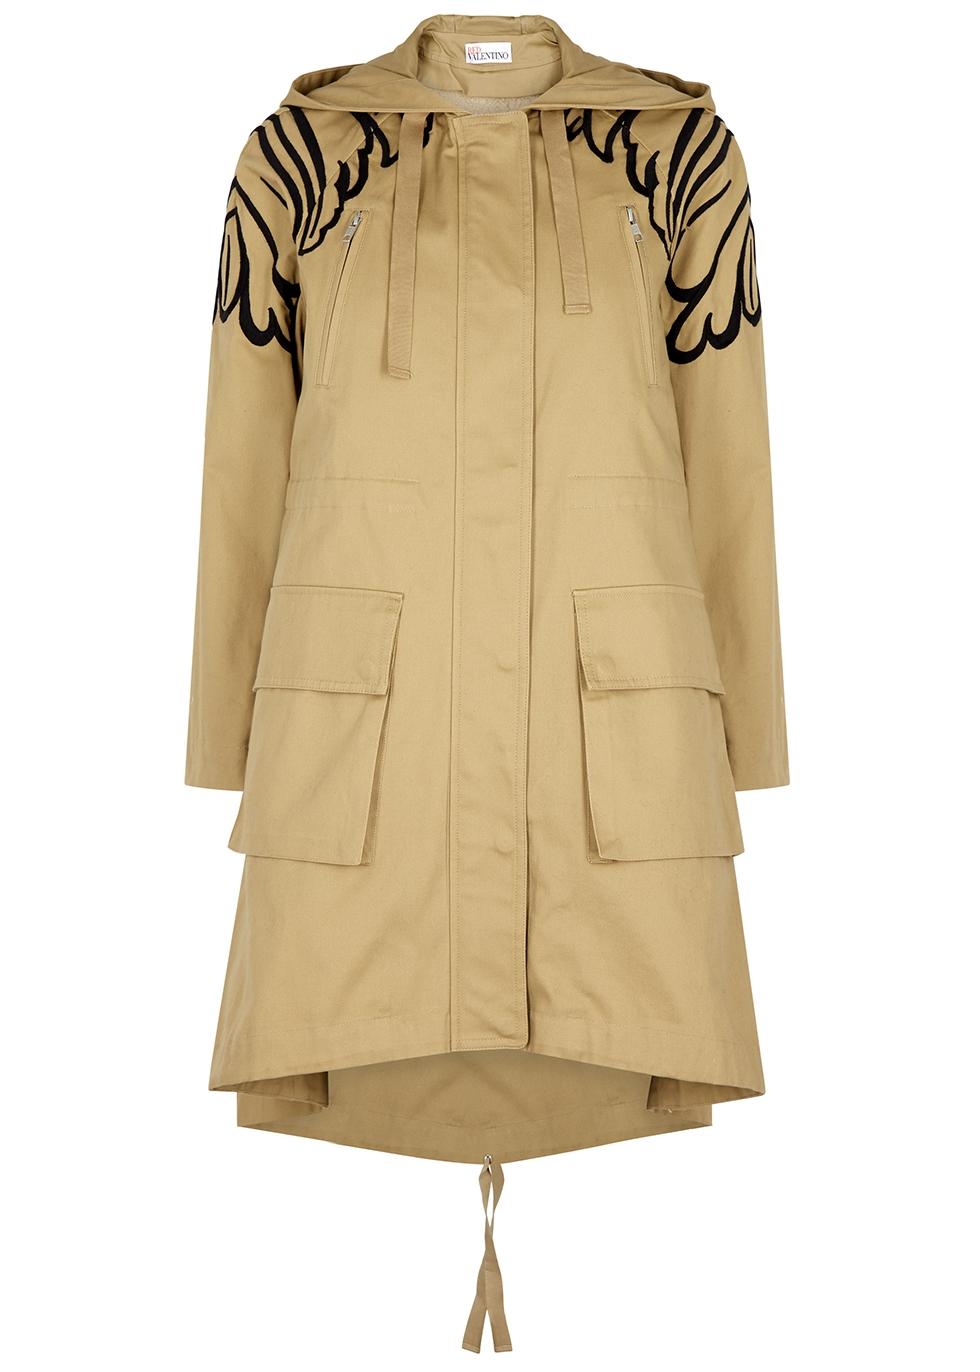 6c20bbd514c2 Designer Coats - Women's Winter Coats - Harvey Nichols